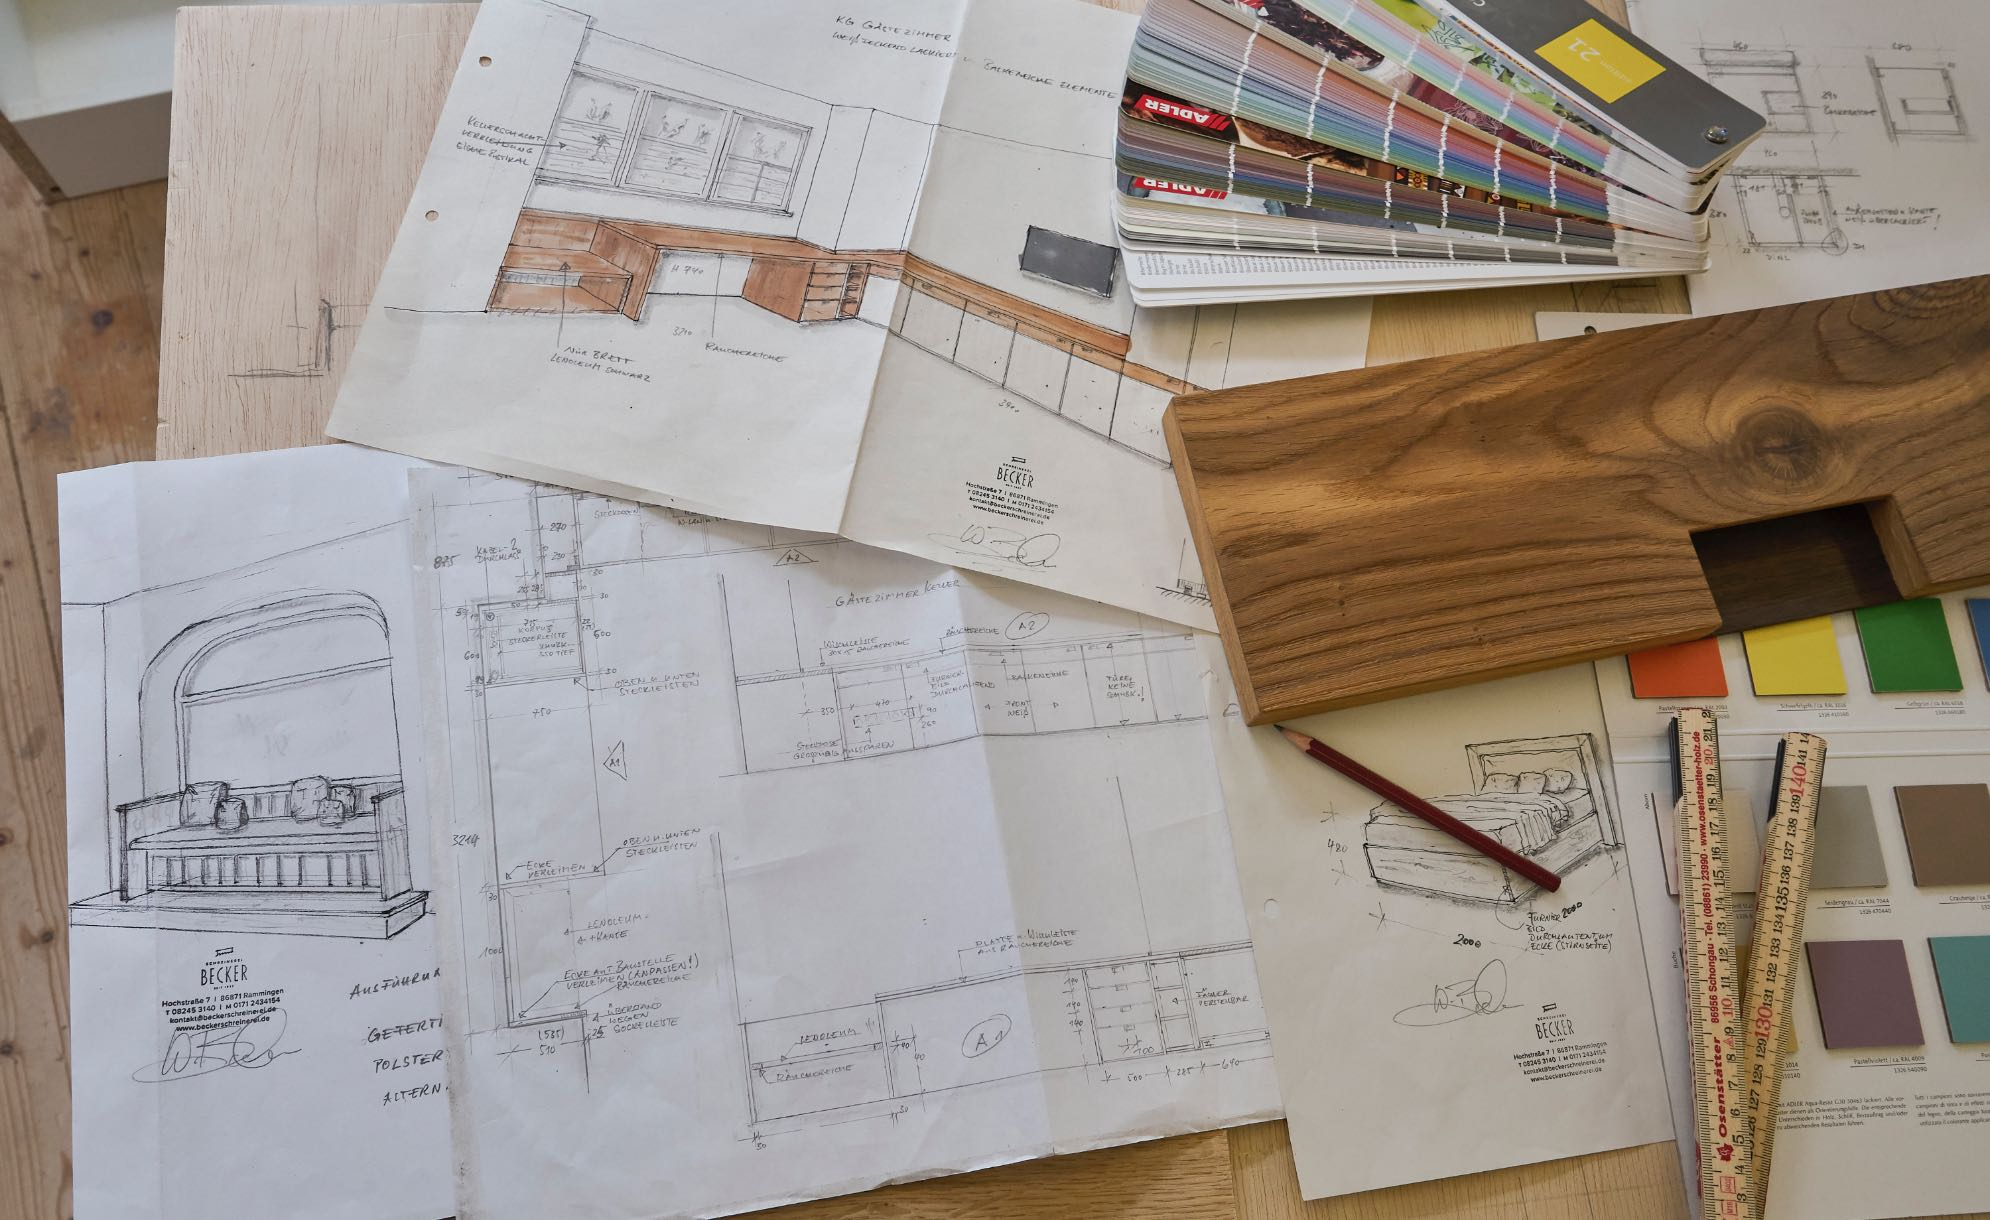 Planung und Bemusterung